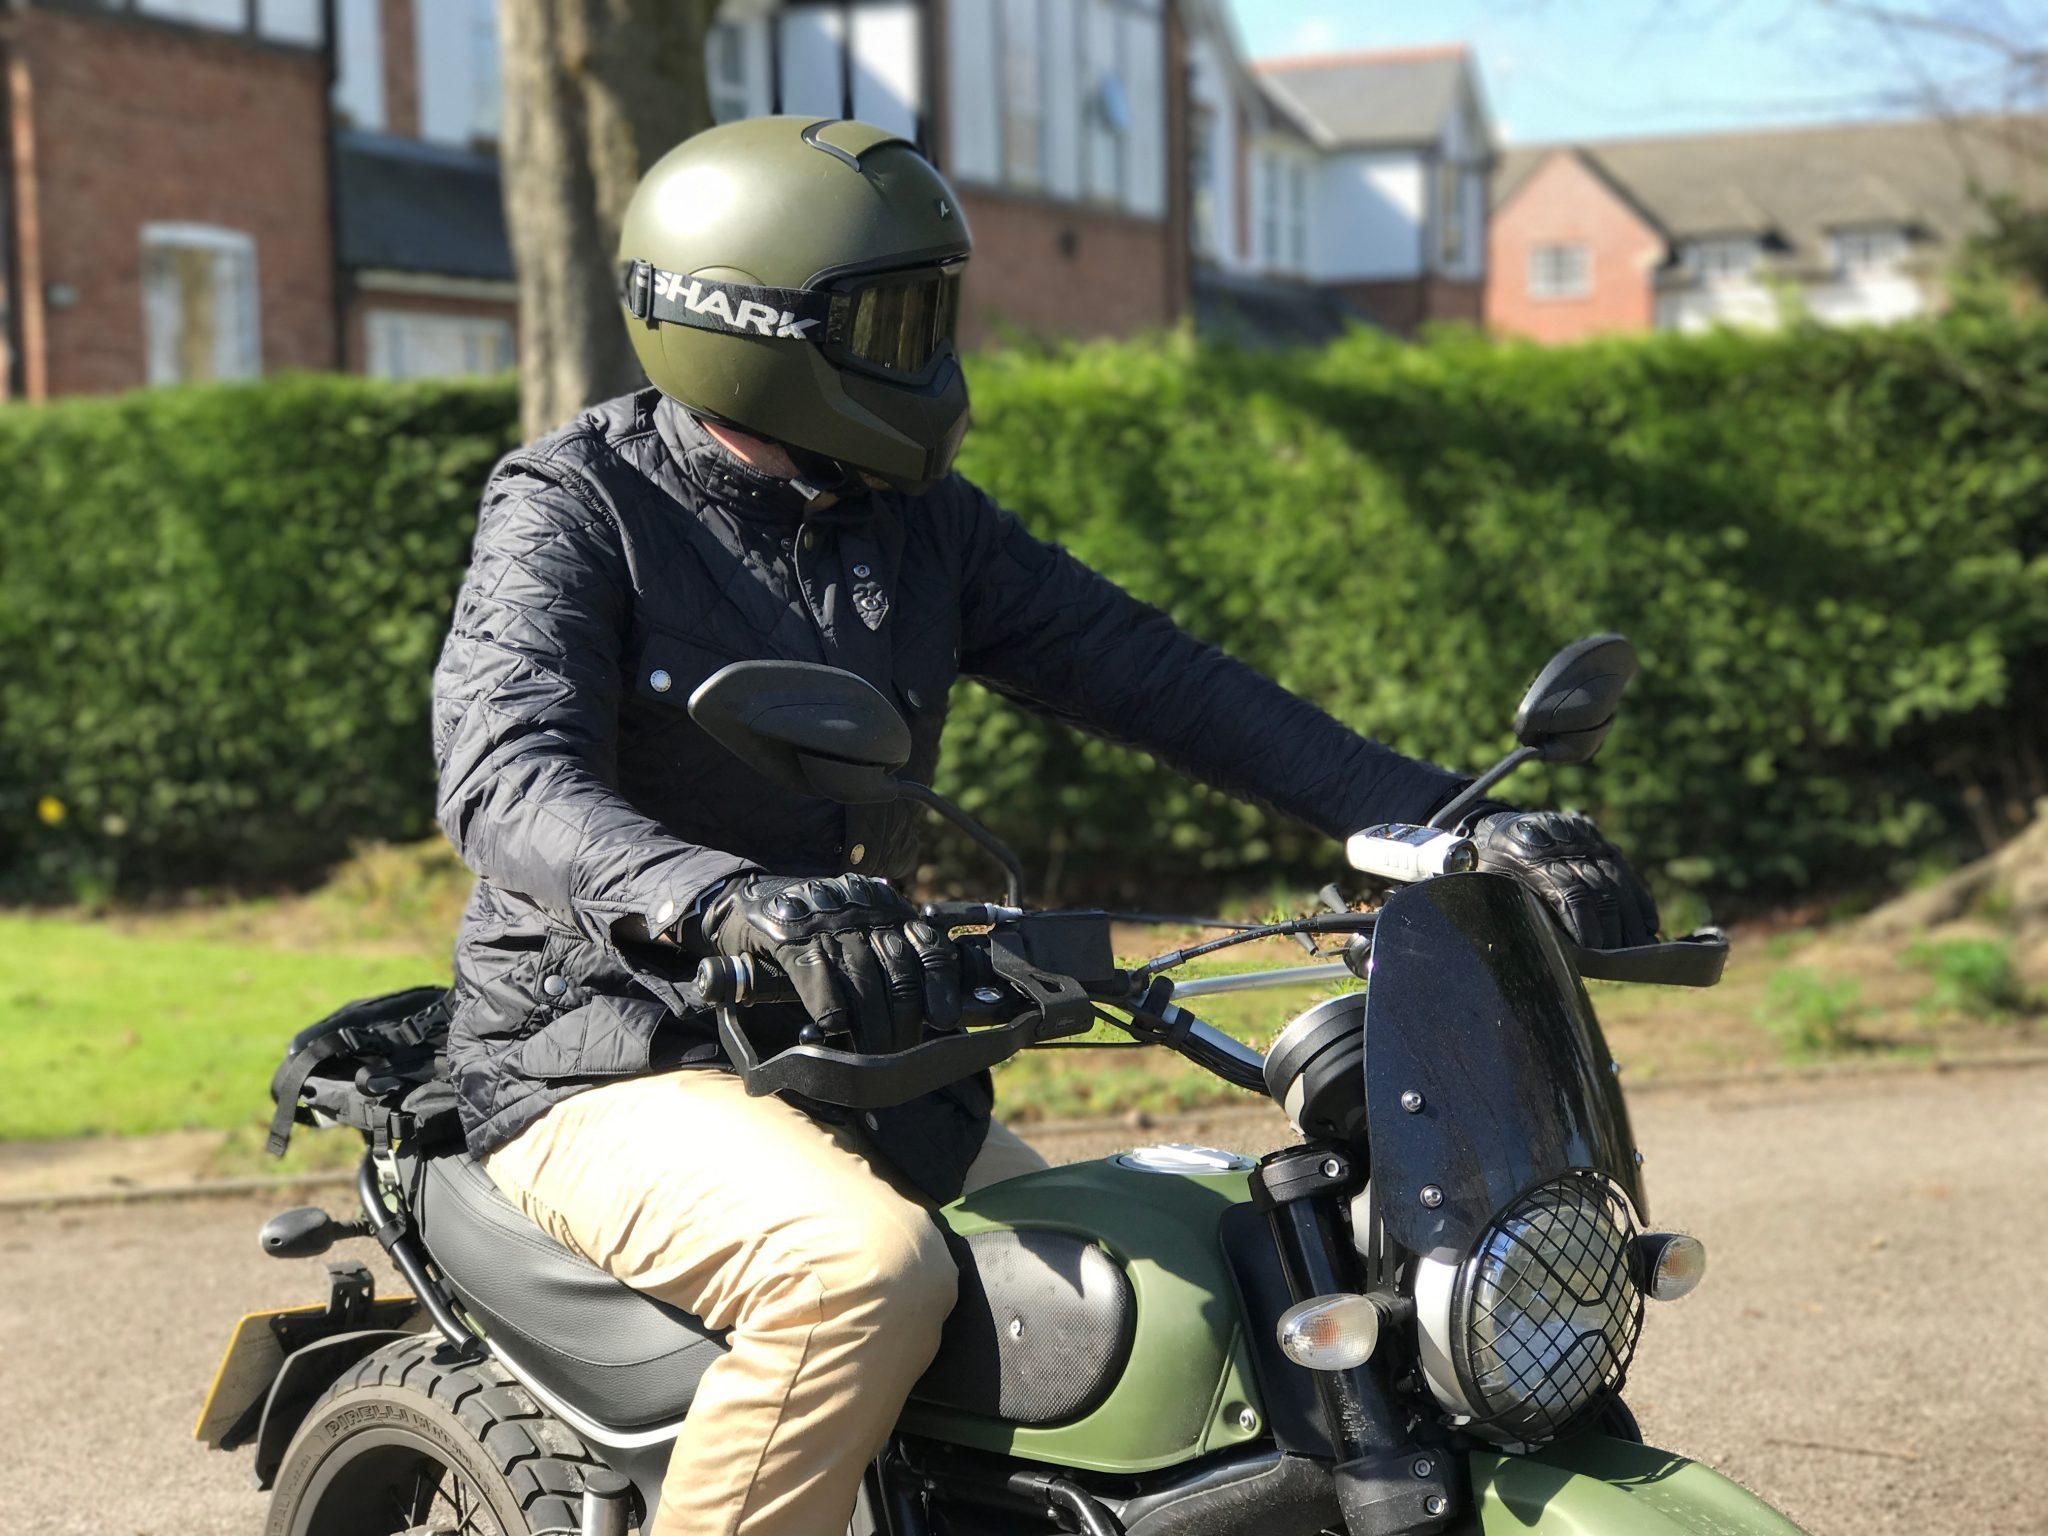 Scrambler Guy Uk Motorcycling Blogger On A Scrambler Ducati Urban